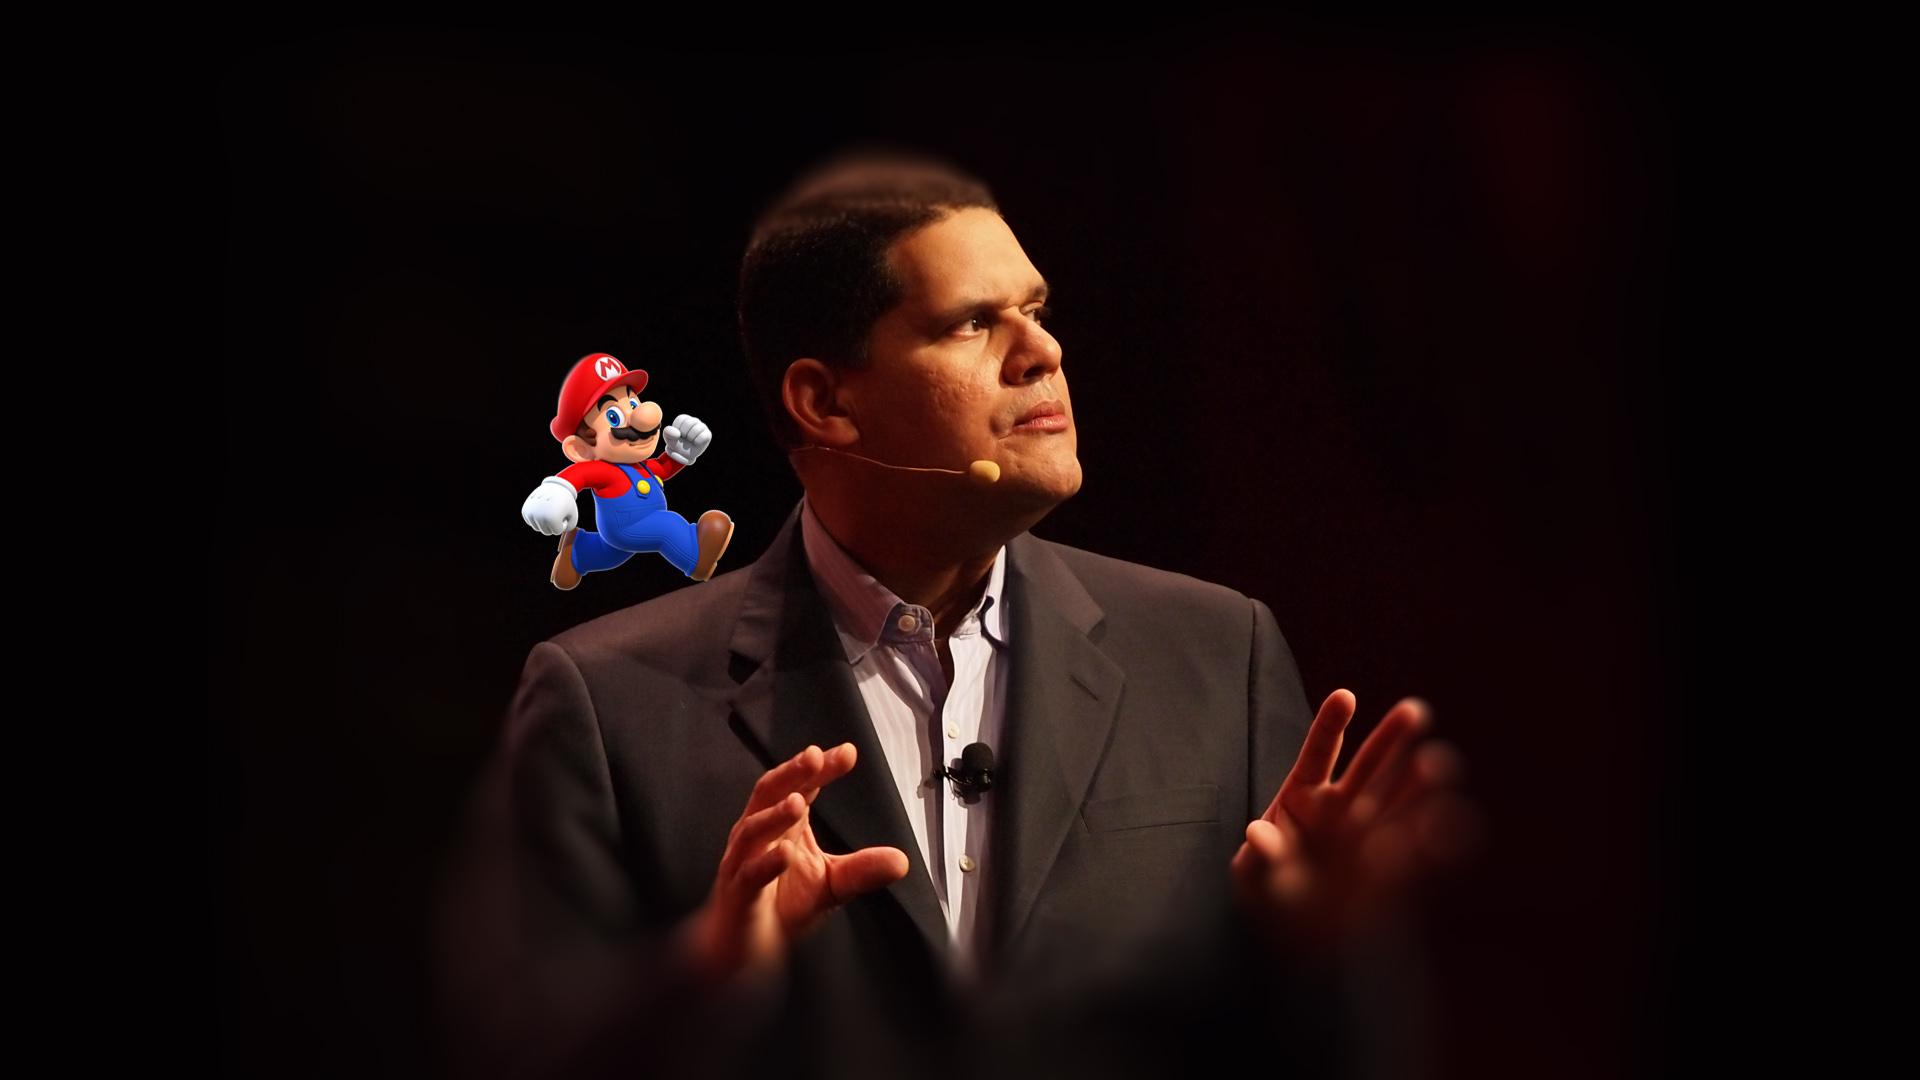 Reggie Leaves Nintendo